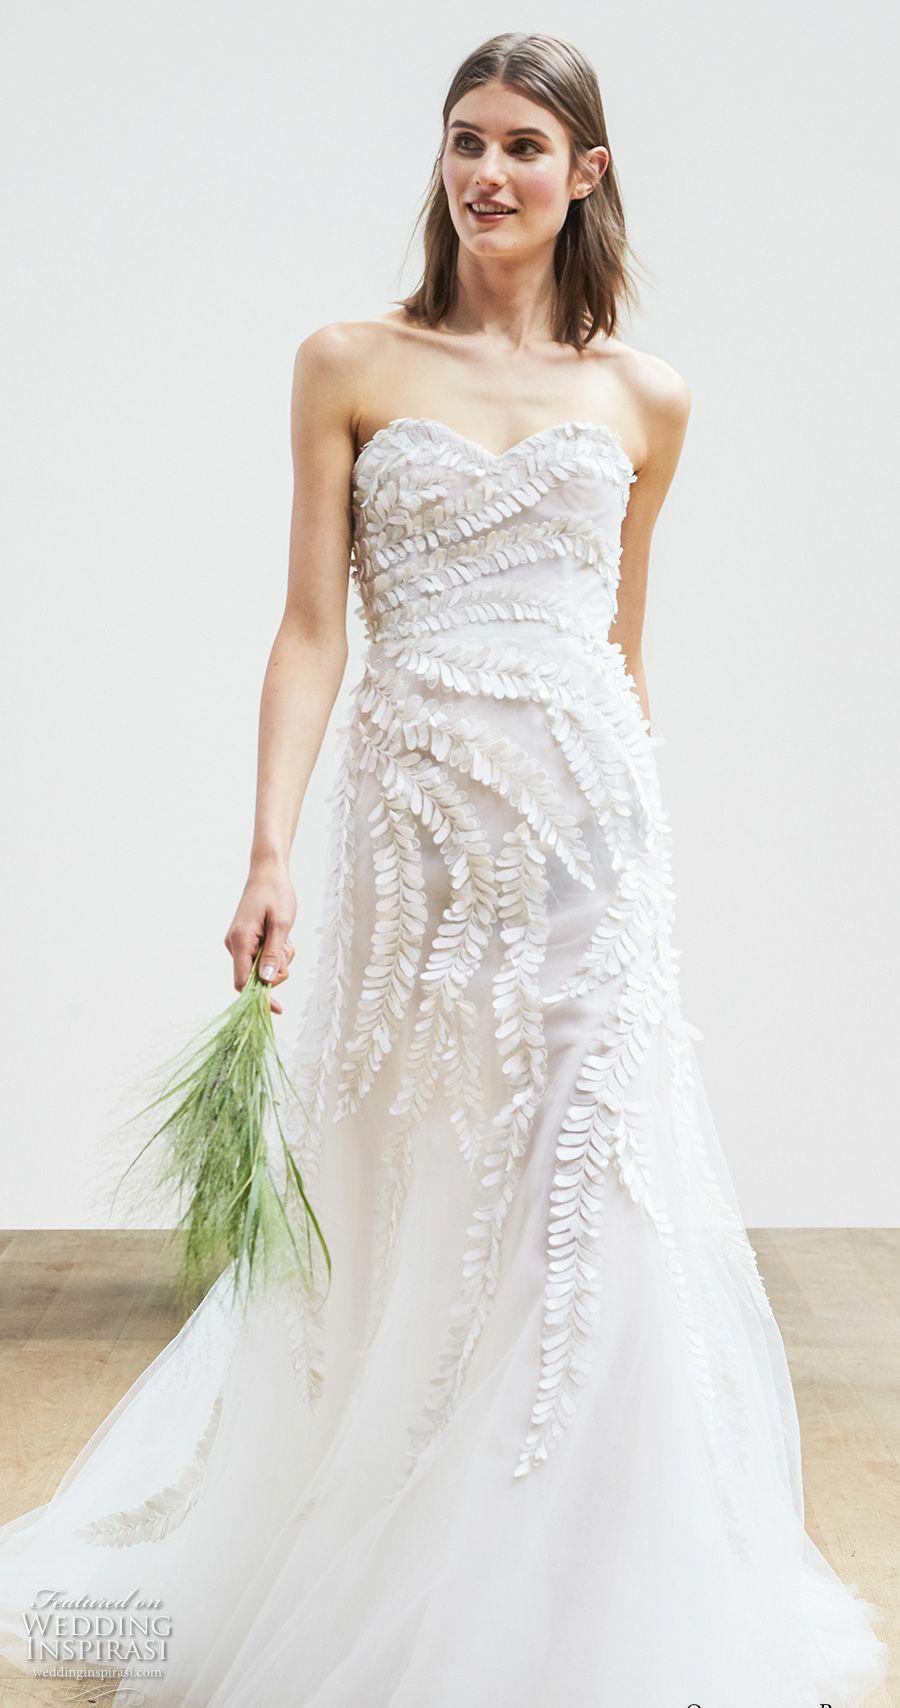 Oscar De La Renta Wedding Dresses.Elegant Romantic A Line Wedding Dresses 2018 Oscar De La Renta Bridal Sweetheart Neckline Embellished Bodice Chapel Train